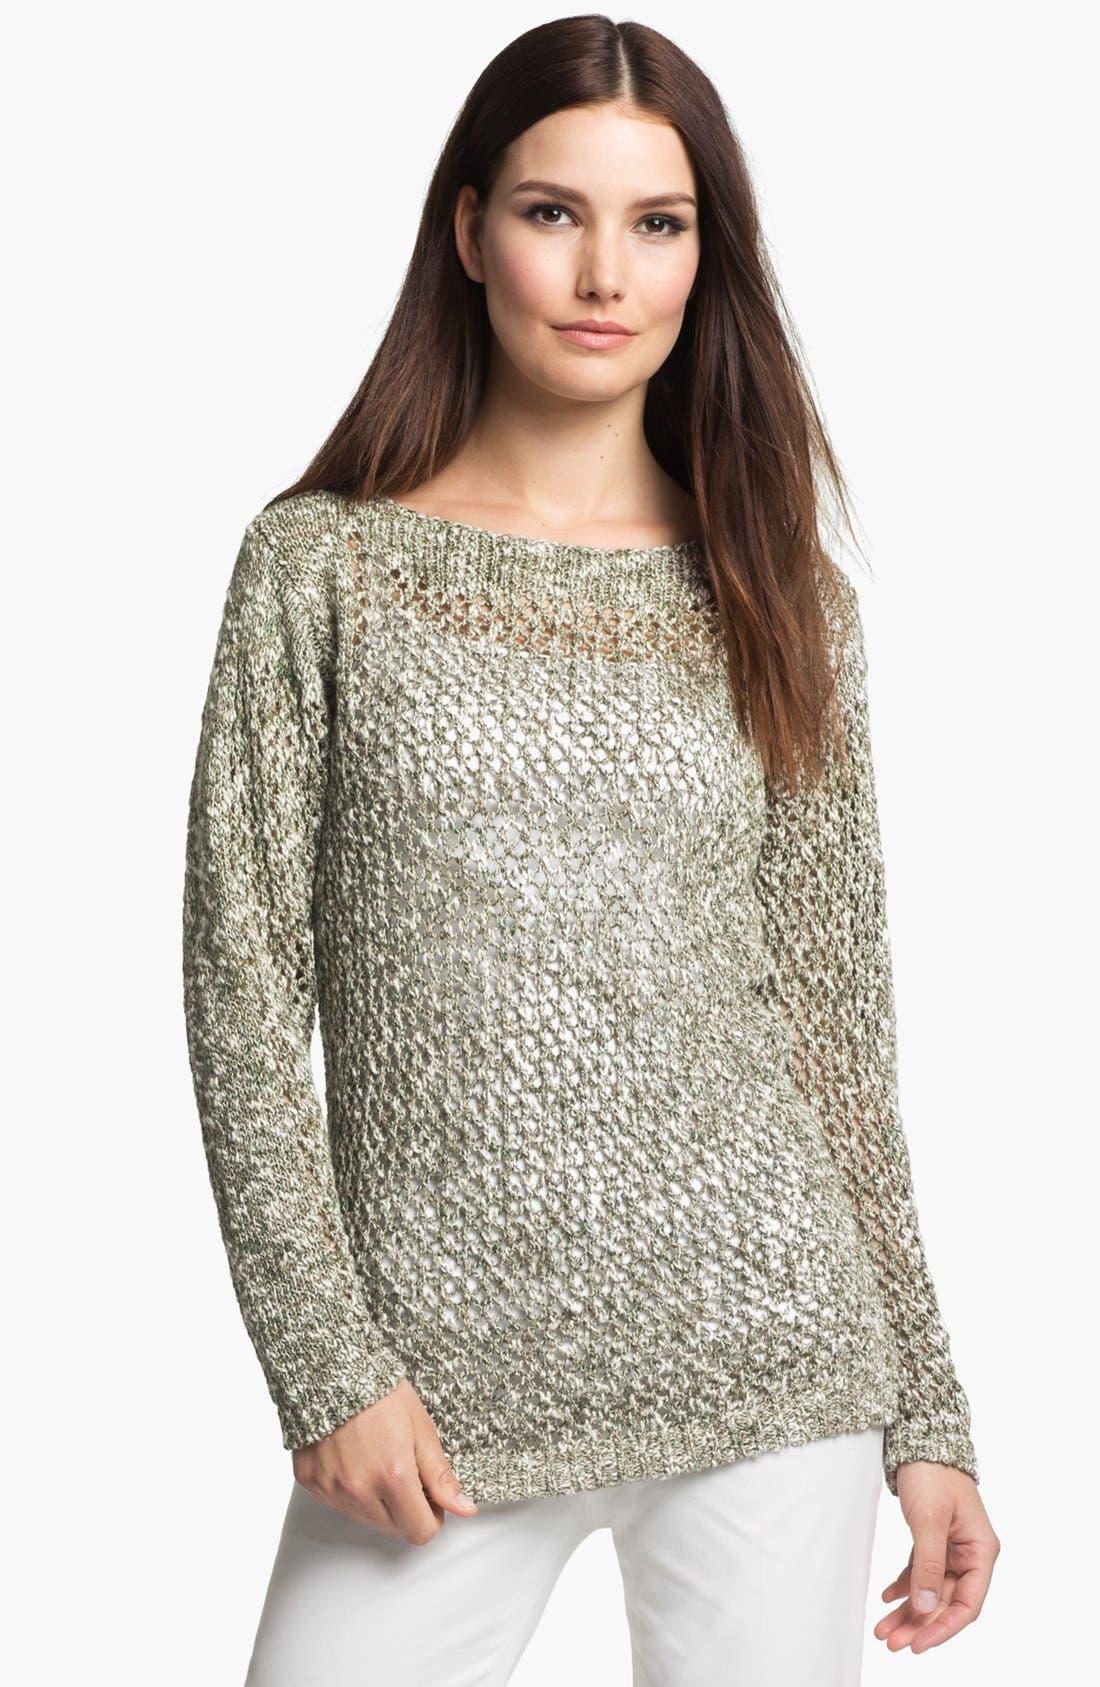 Alternate Image 1 Selected - Lafayette 148 New York 'Chromatic Mélange' Net Stitch Sweater